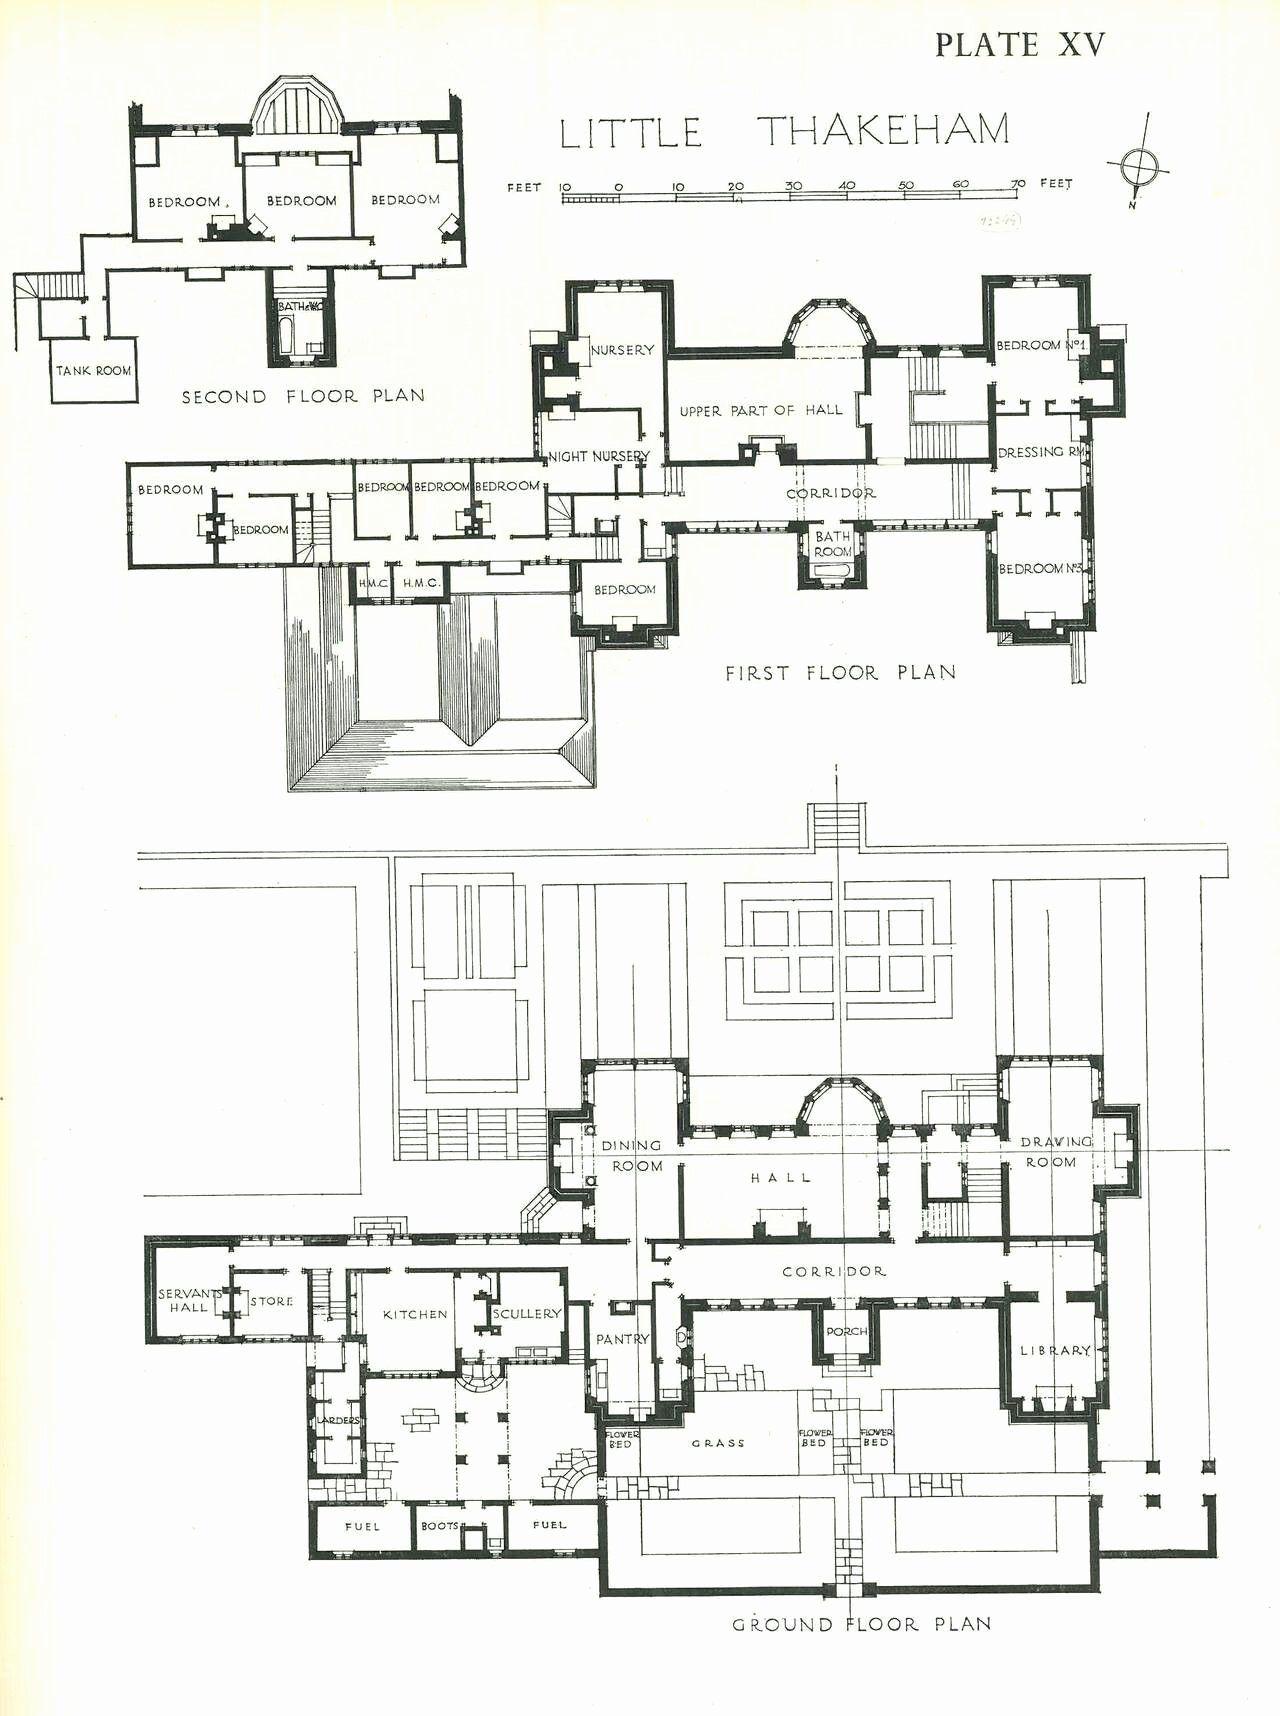 Historic Georgian House Plans Inspirational Little Thakeham Floor Plan 1 280 1 716 Pixels In 2020 House Floor Plans Architectural Floor Plans House Plans